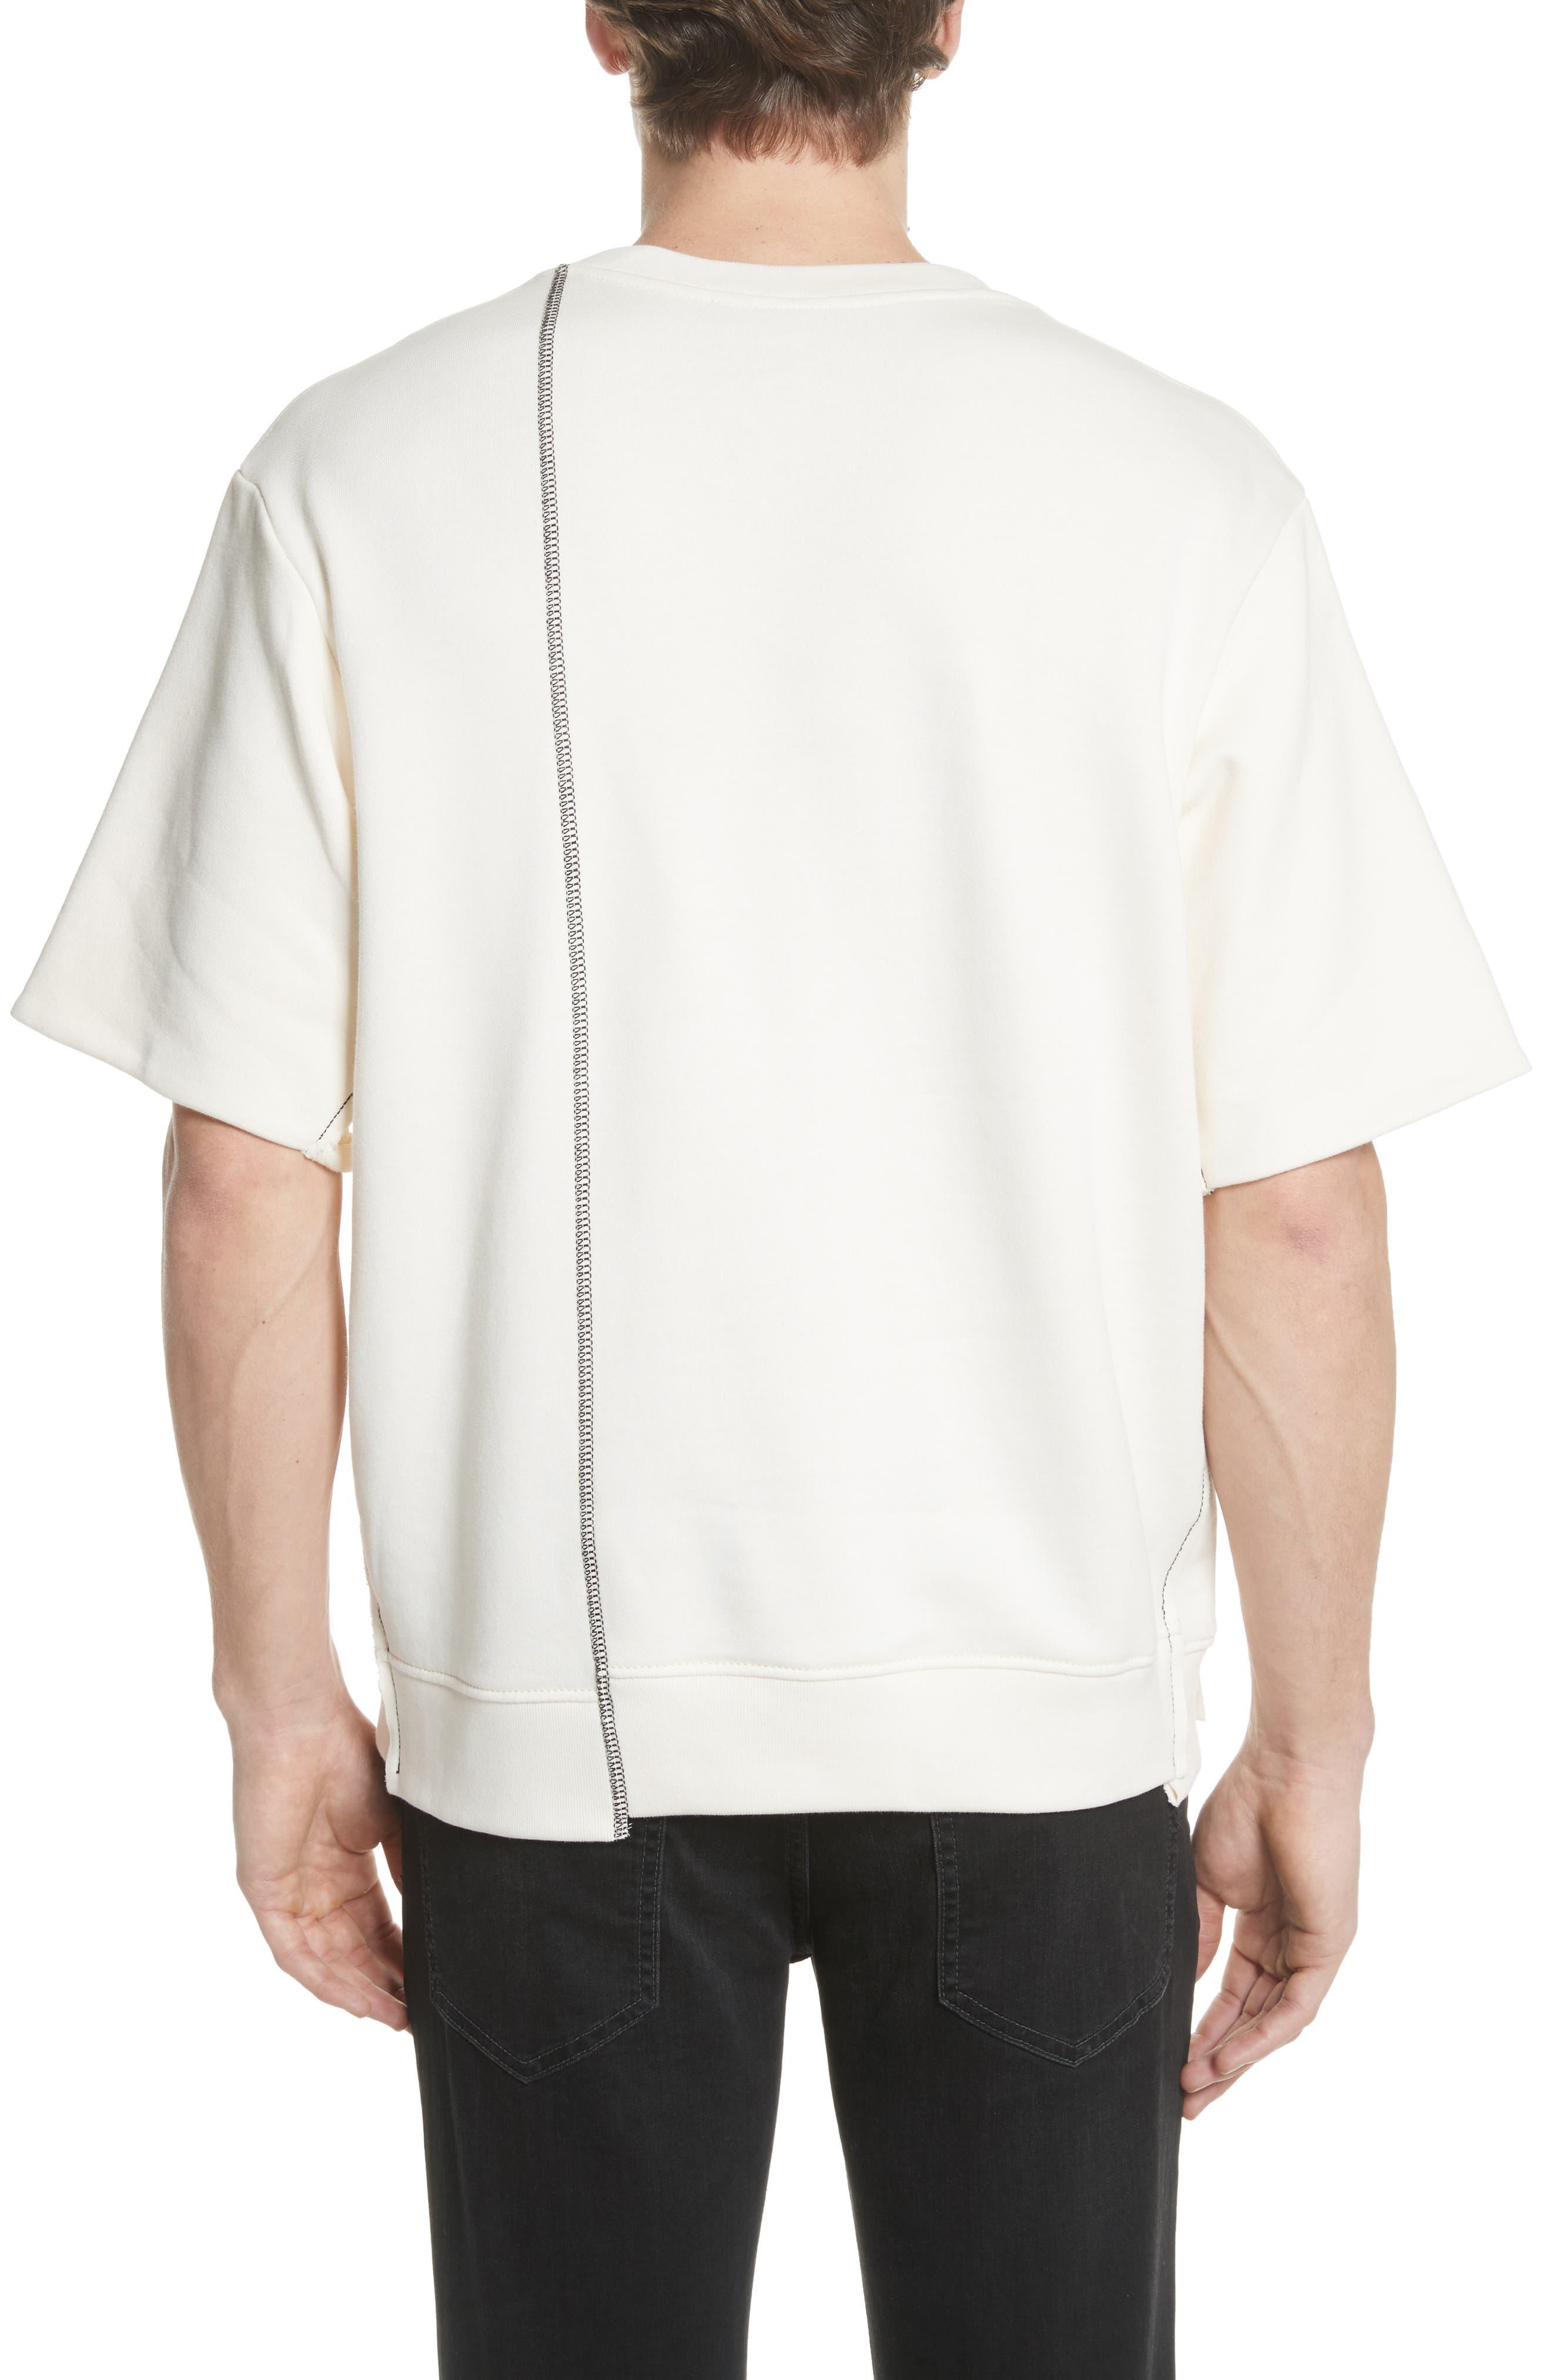 Alternate Image 2  - 3.1 Phillip Lim Reconstructed Short Sleeve Sweatshirt